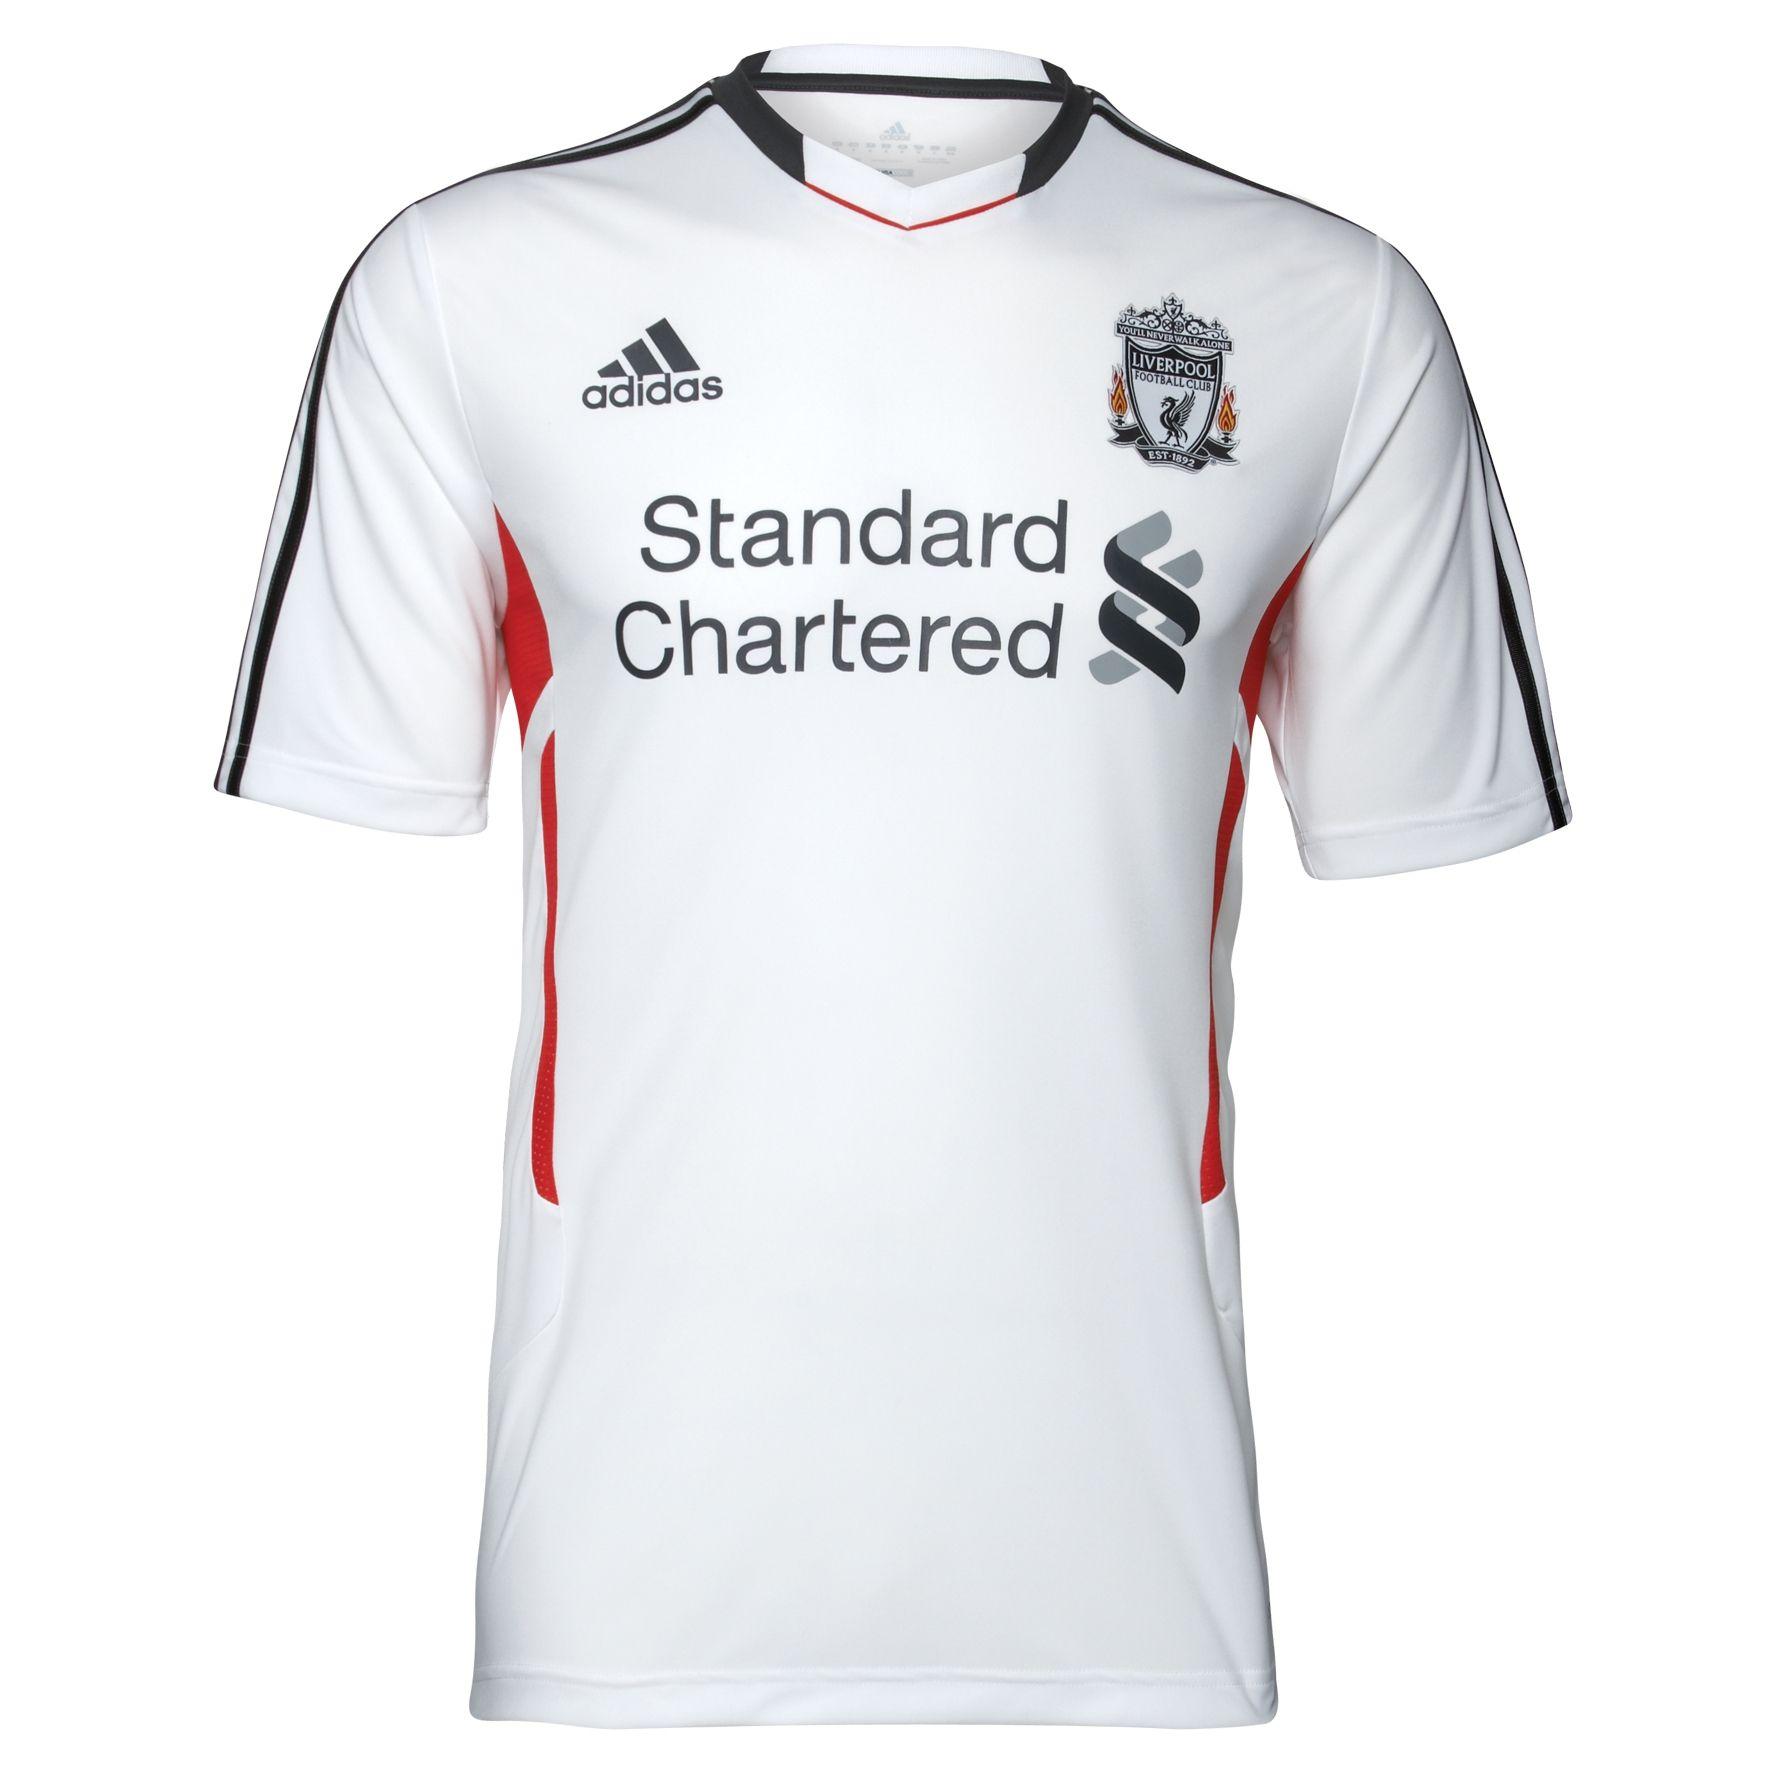 adidas liverpool fc 2012 13 third shirt · soccer jerseysfootball